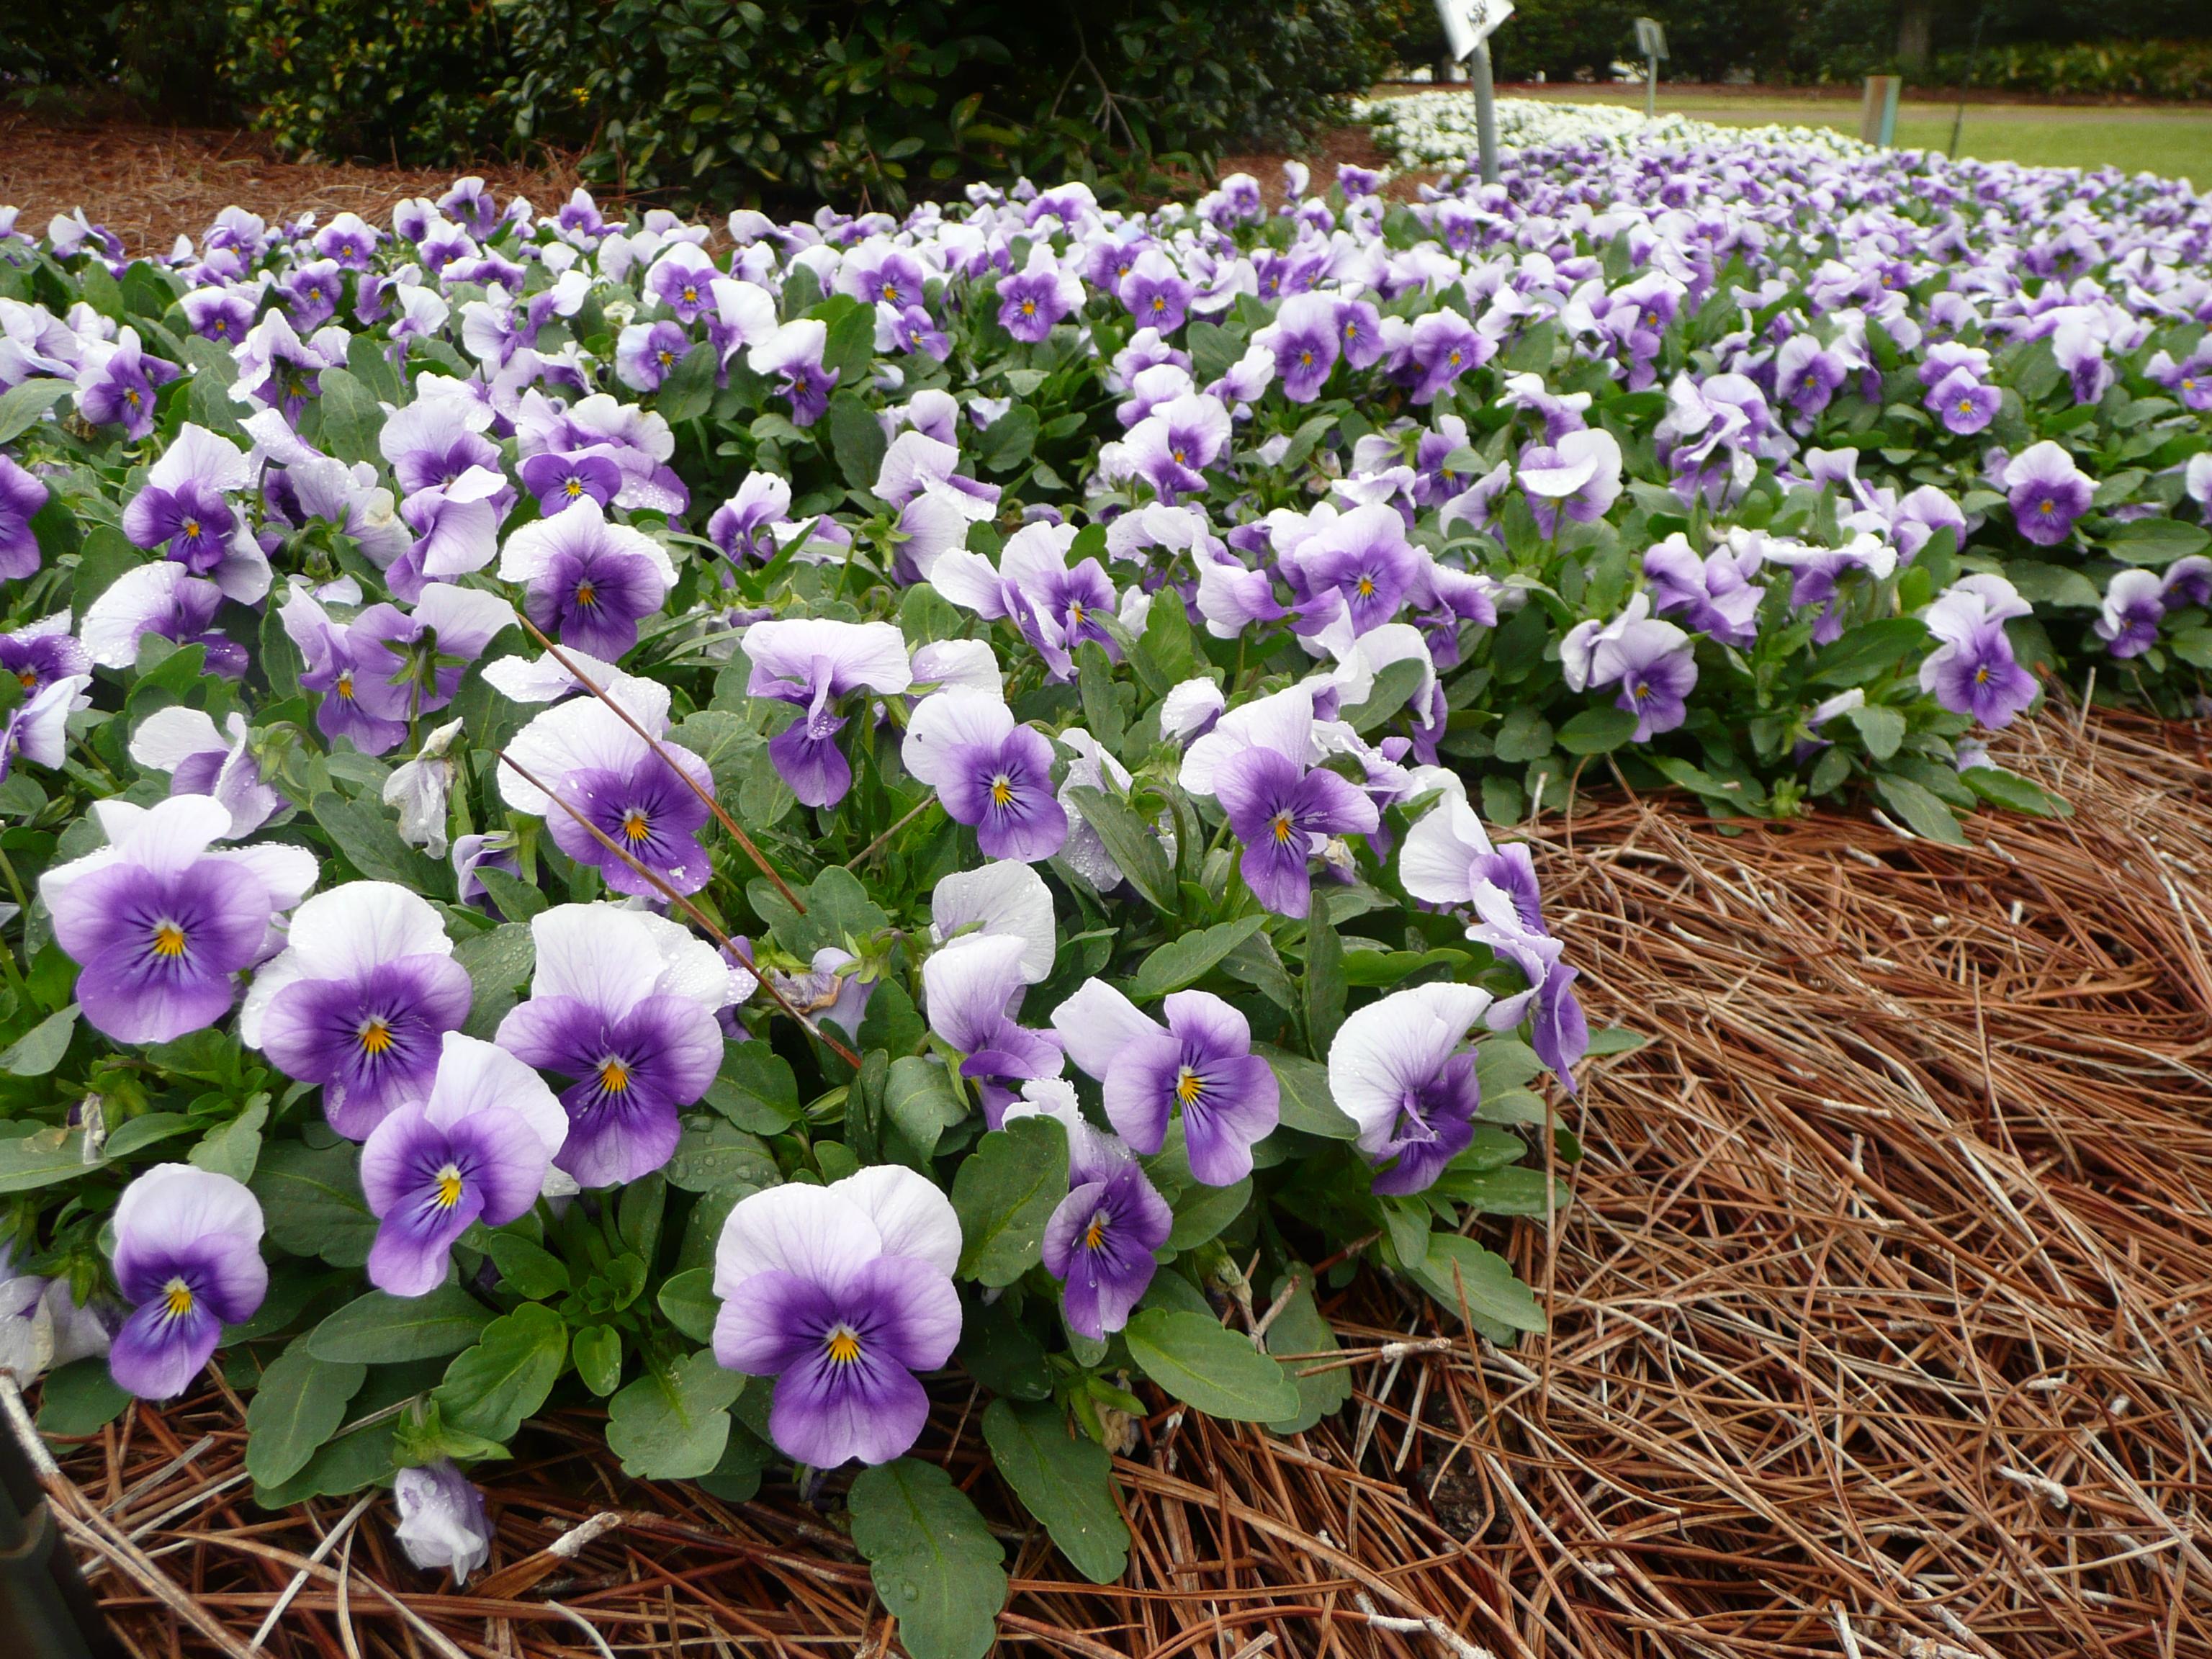 Sorbet Viola Ornamental Plant Of The Week For October 26 2015